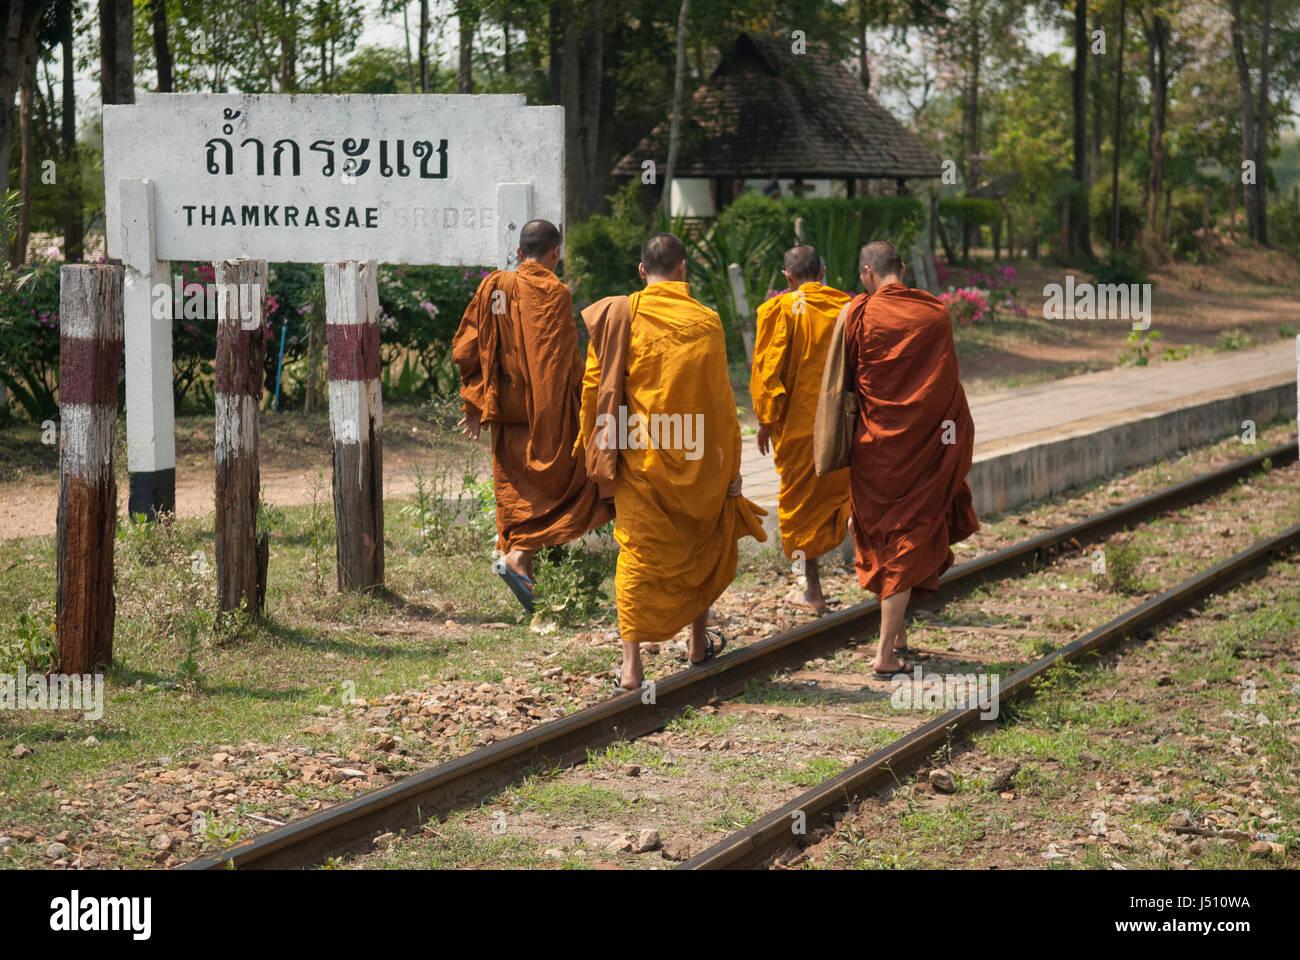 Four buddhist monks walking along the railway track at Thamkrasae Bridge station, Thailand - Stock Image